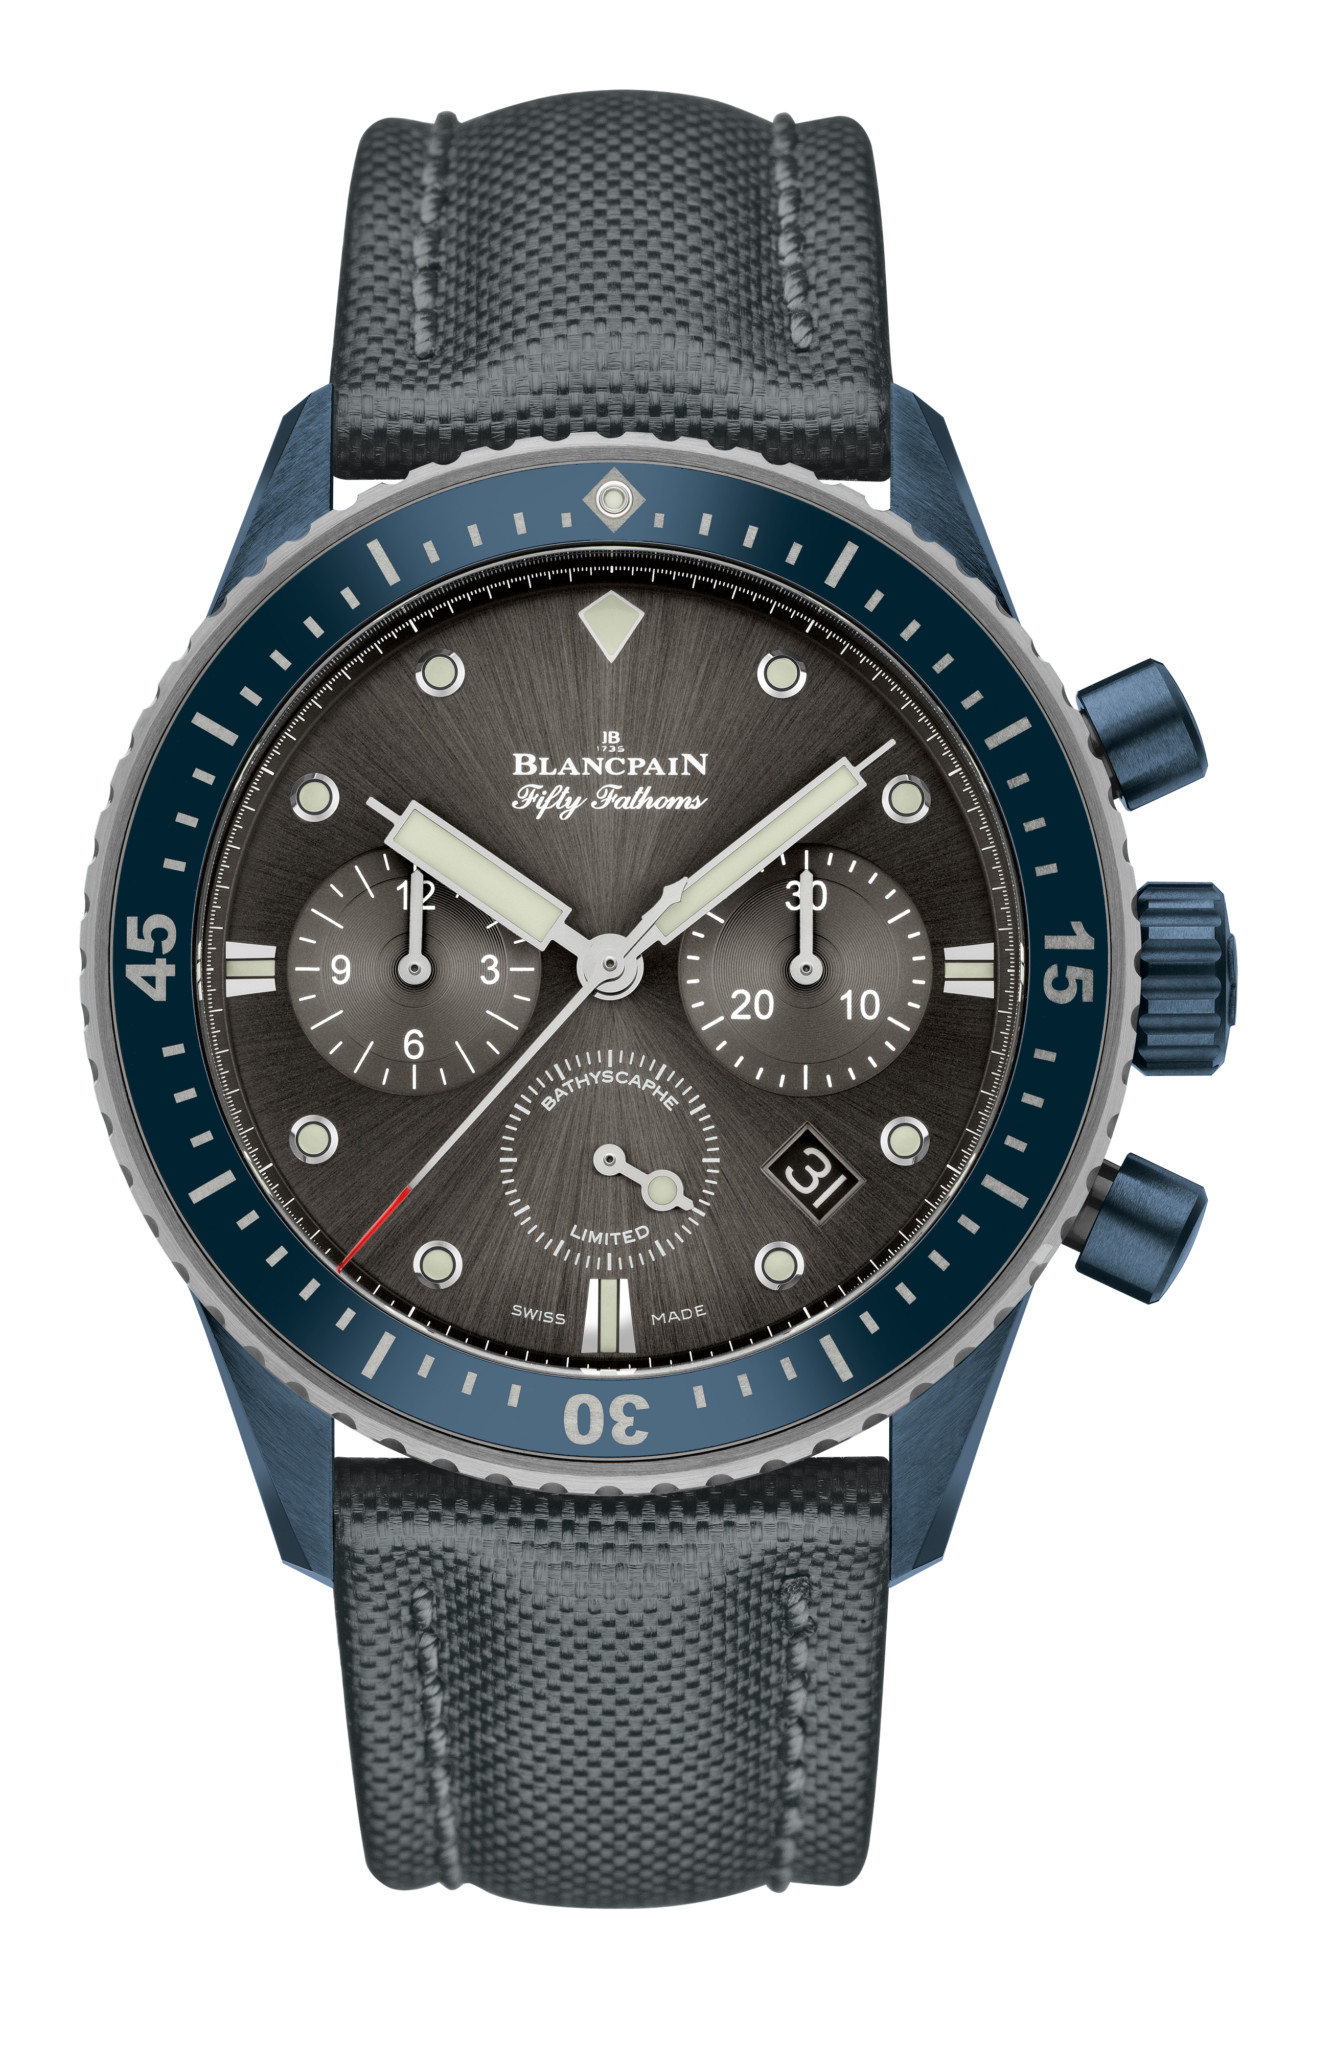 blancpain-bathyscaphe-flyback-chronograph-blancpain-ocean-commitment-ii-front